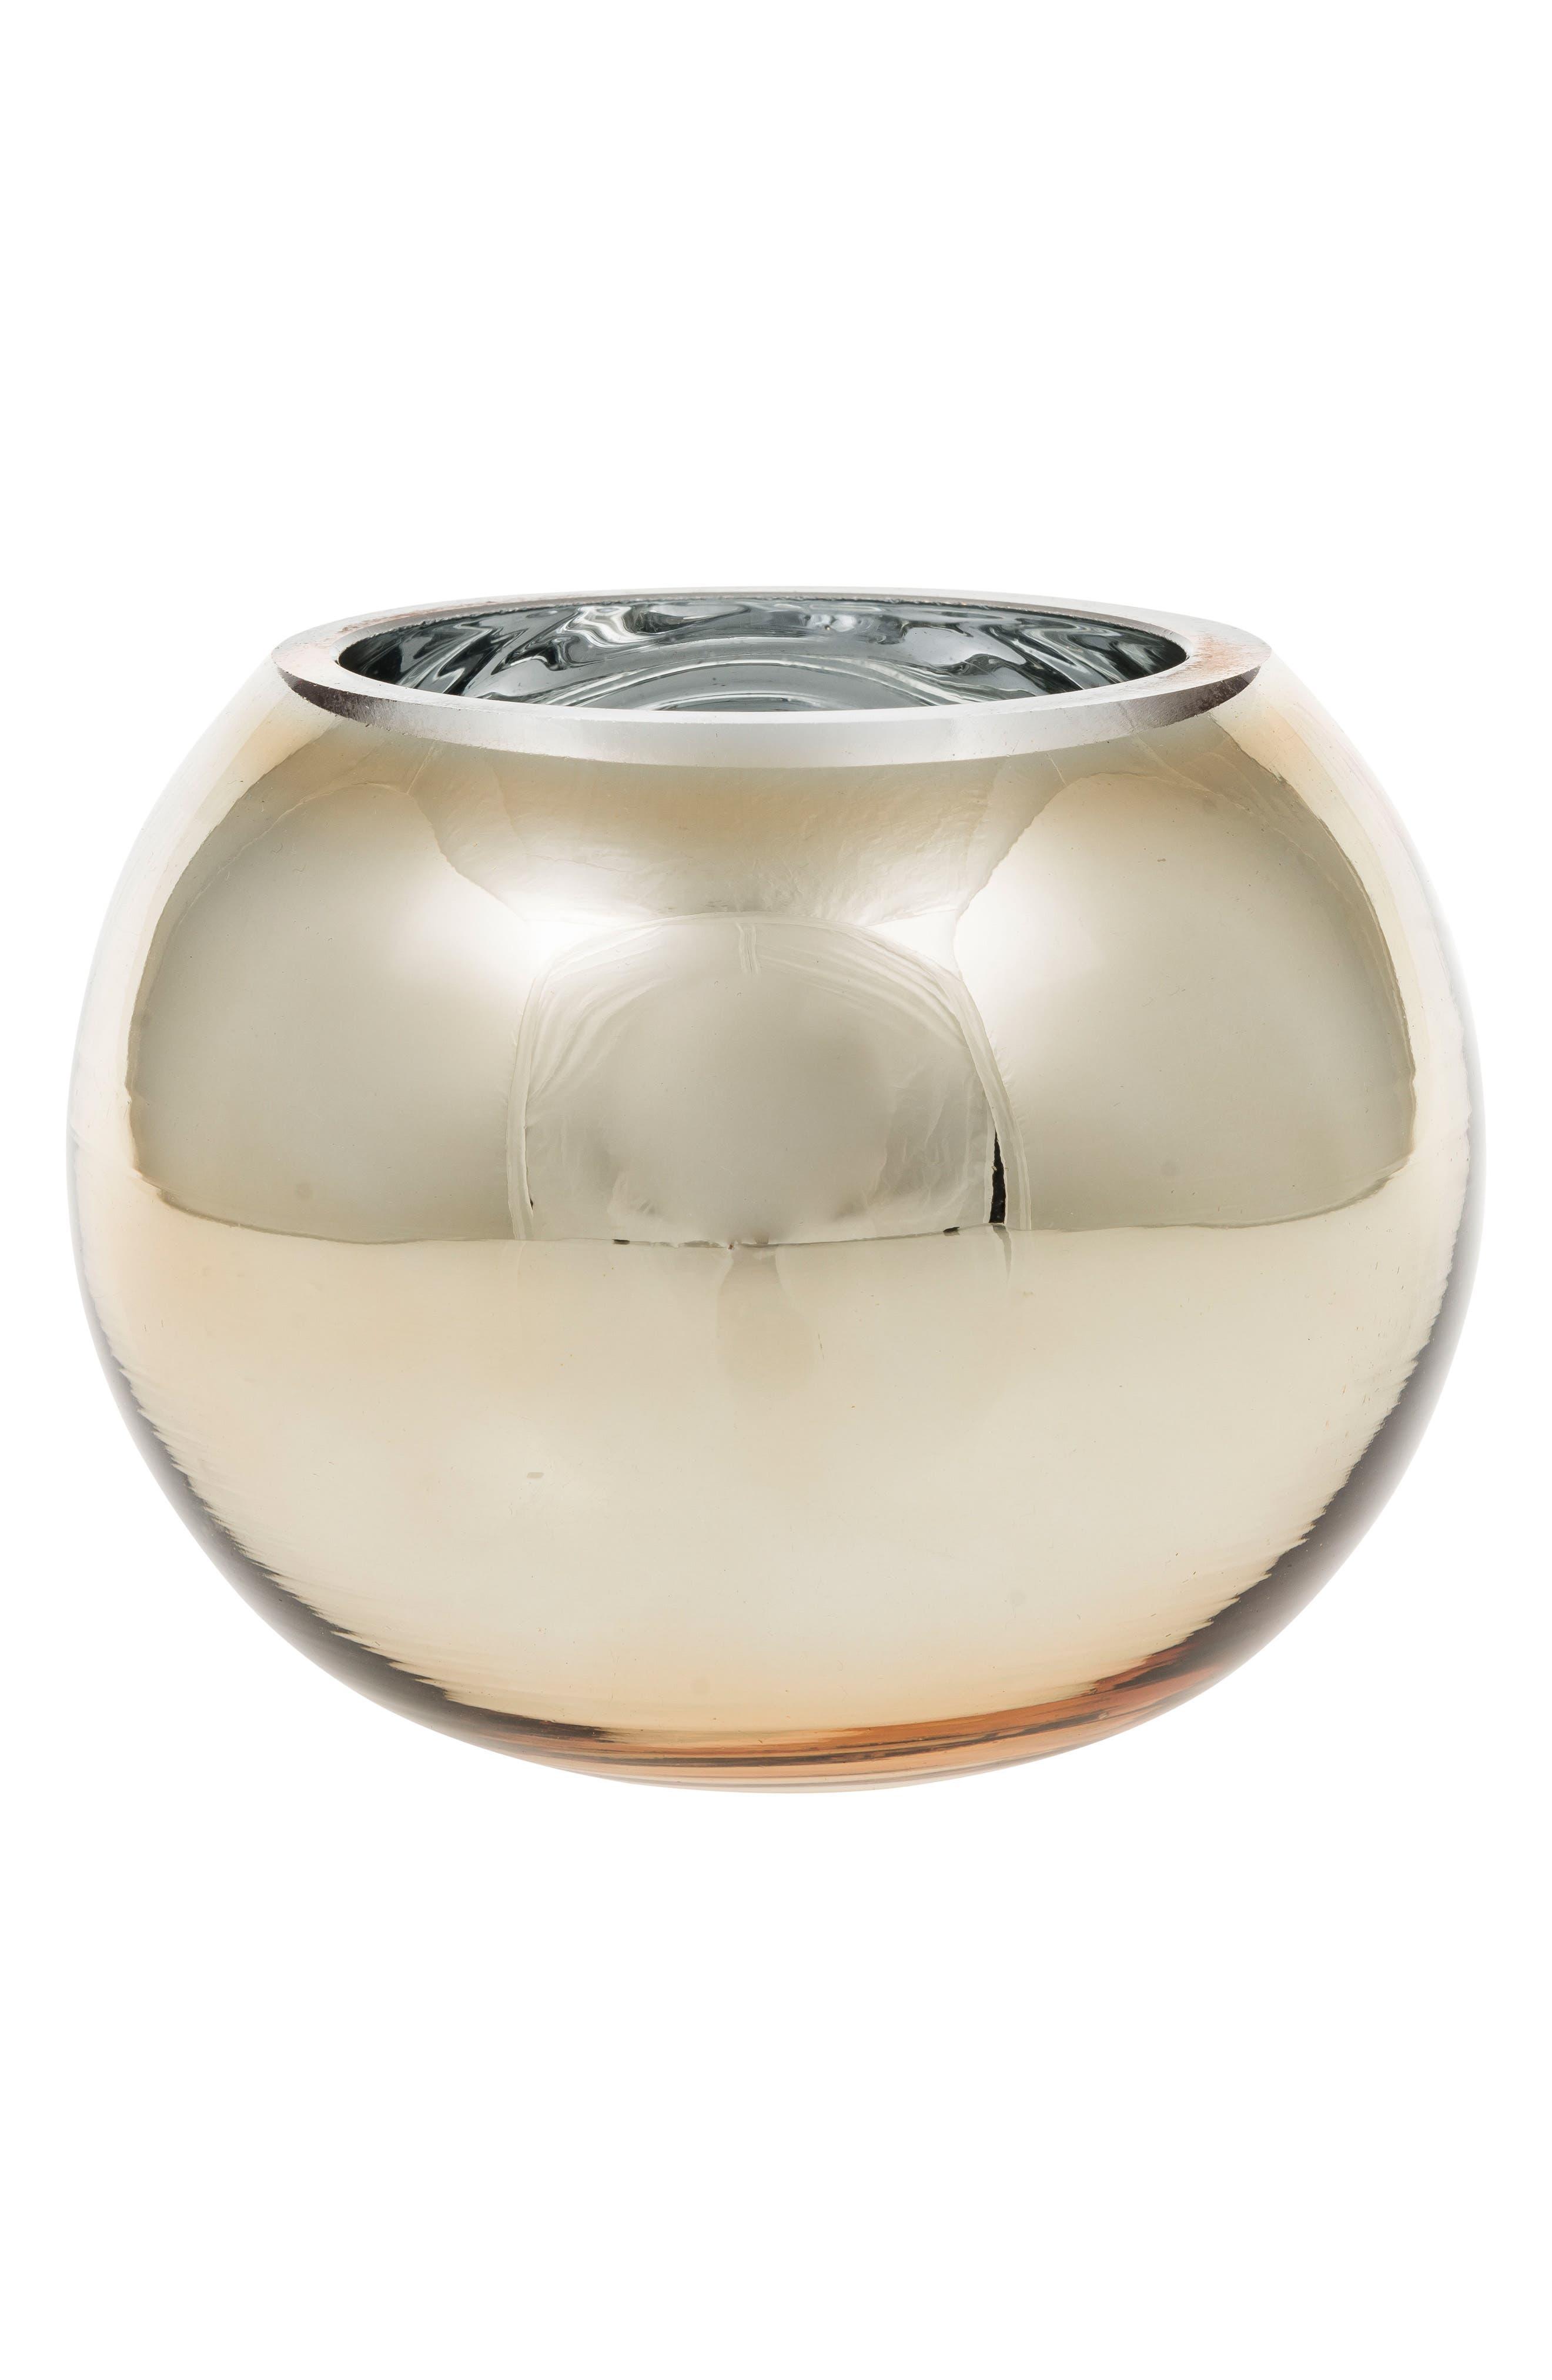 Main Image - Eightmood Nemo Vase